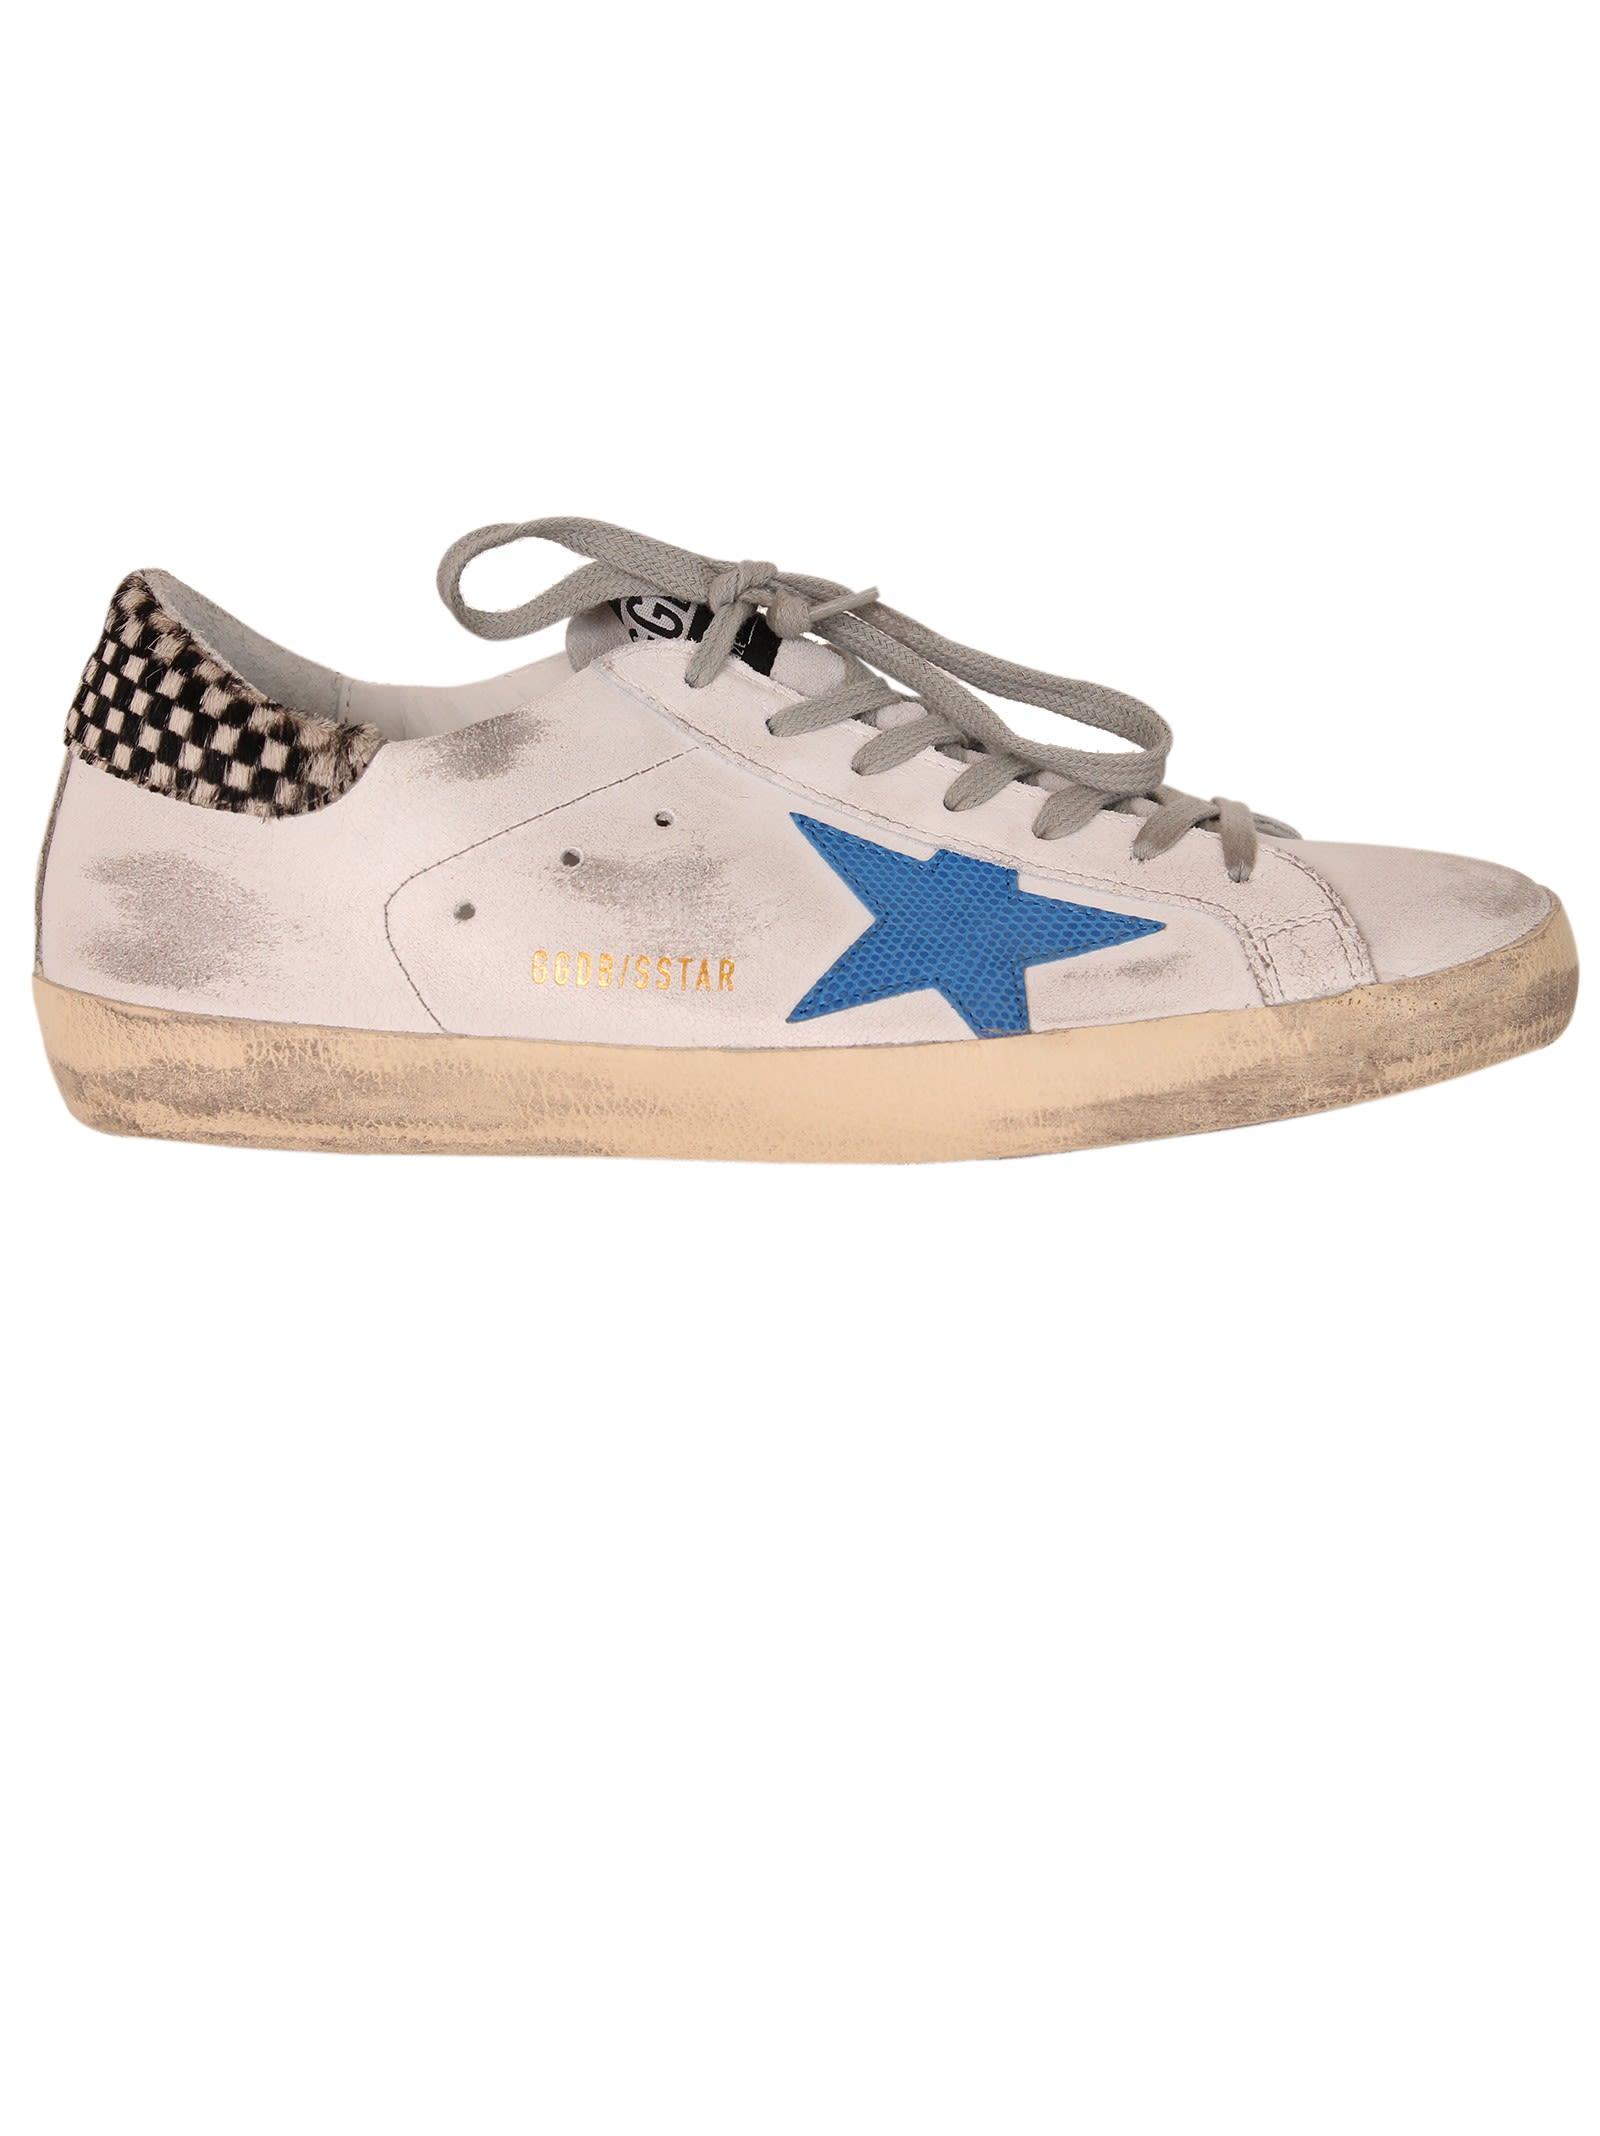 Golden Goose & Crack Check Superstar Sneakers z87oE7n6